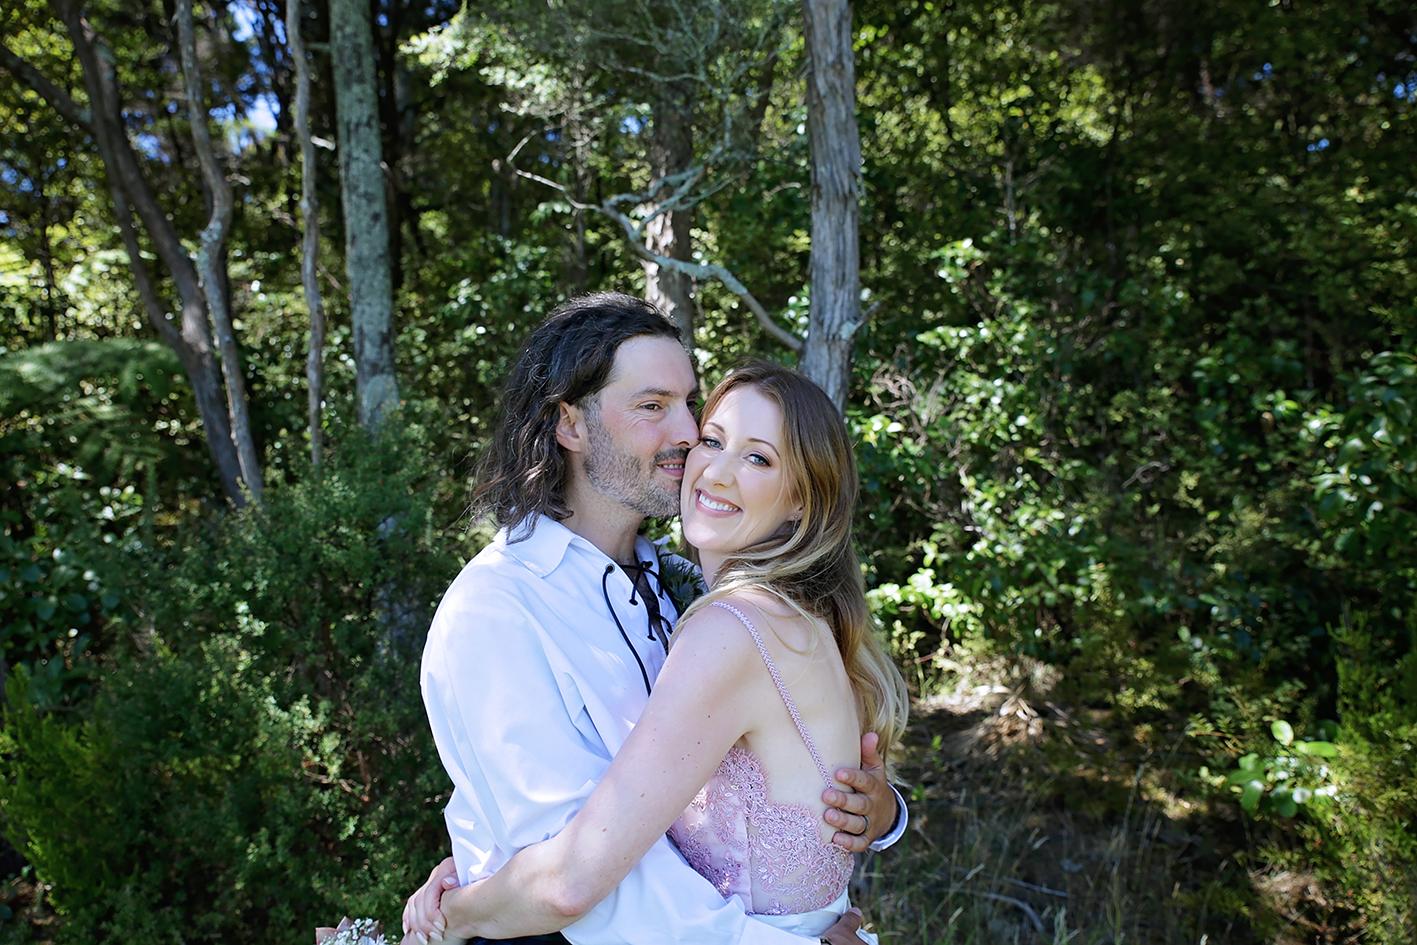 Elizabeth_May_Bridal_Wedding Photos - Brightlights 043.JPG